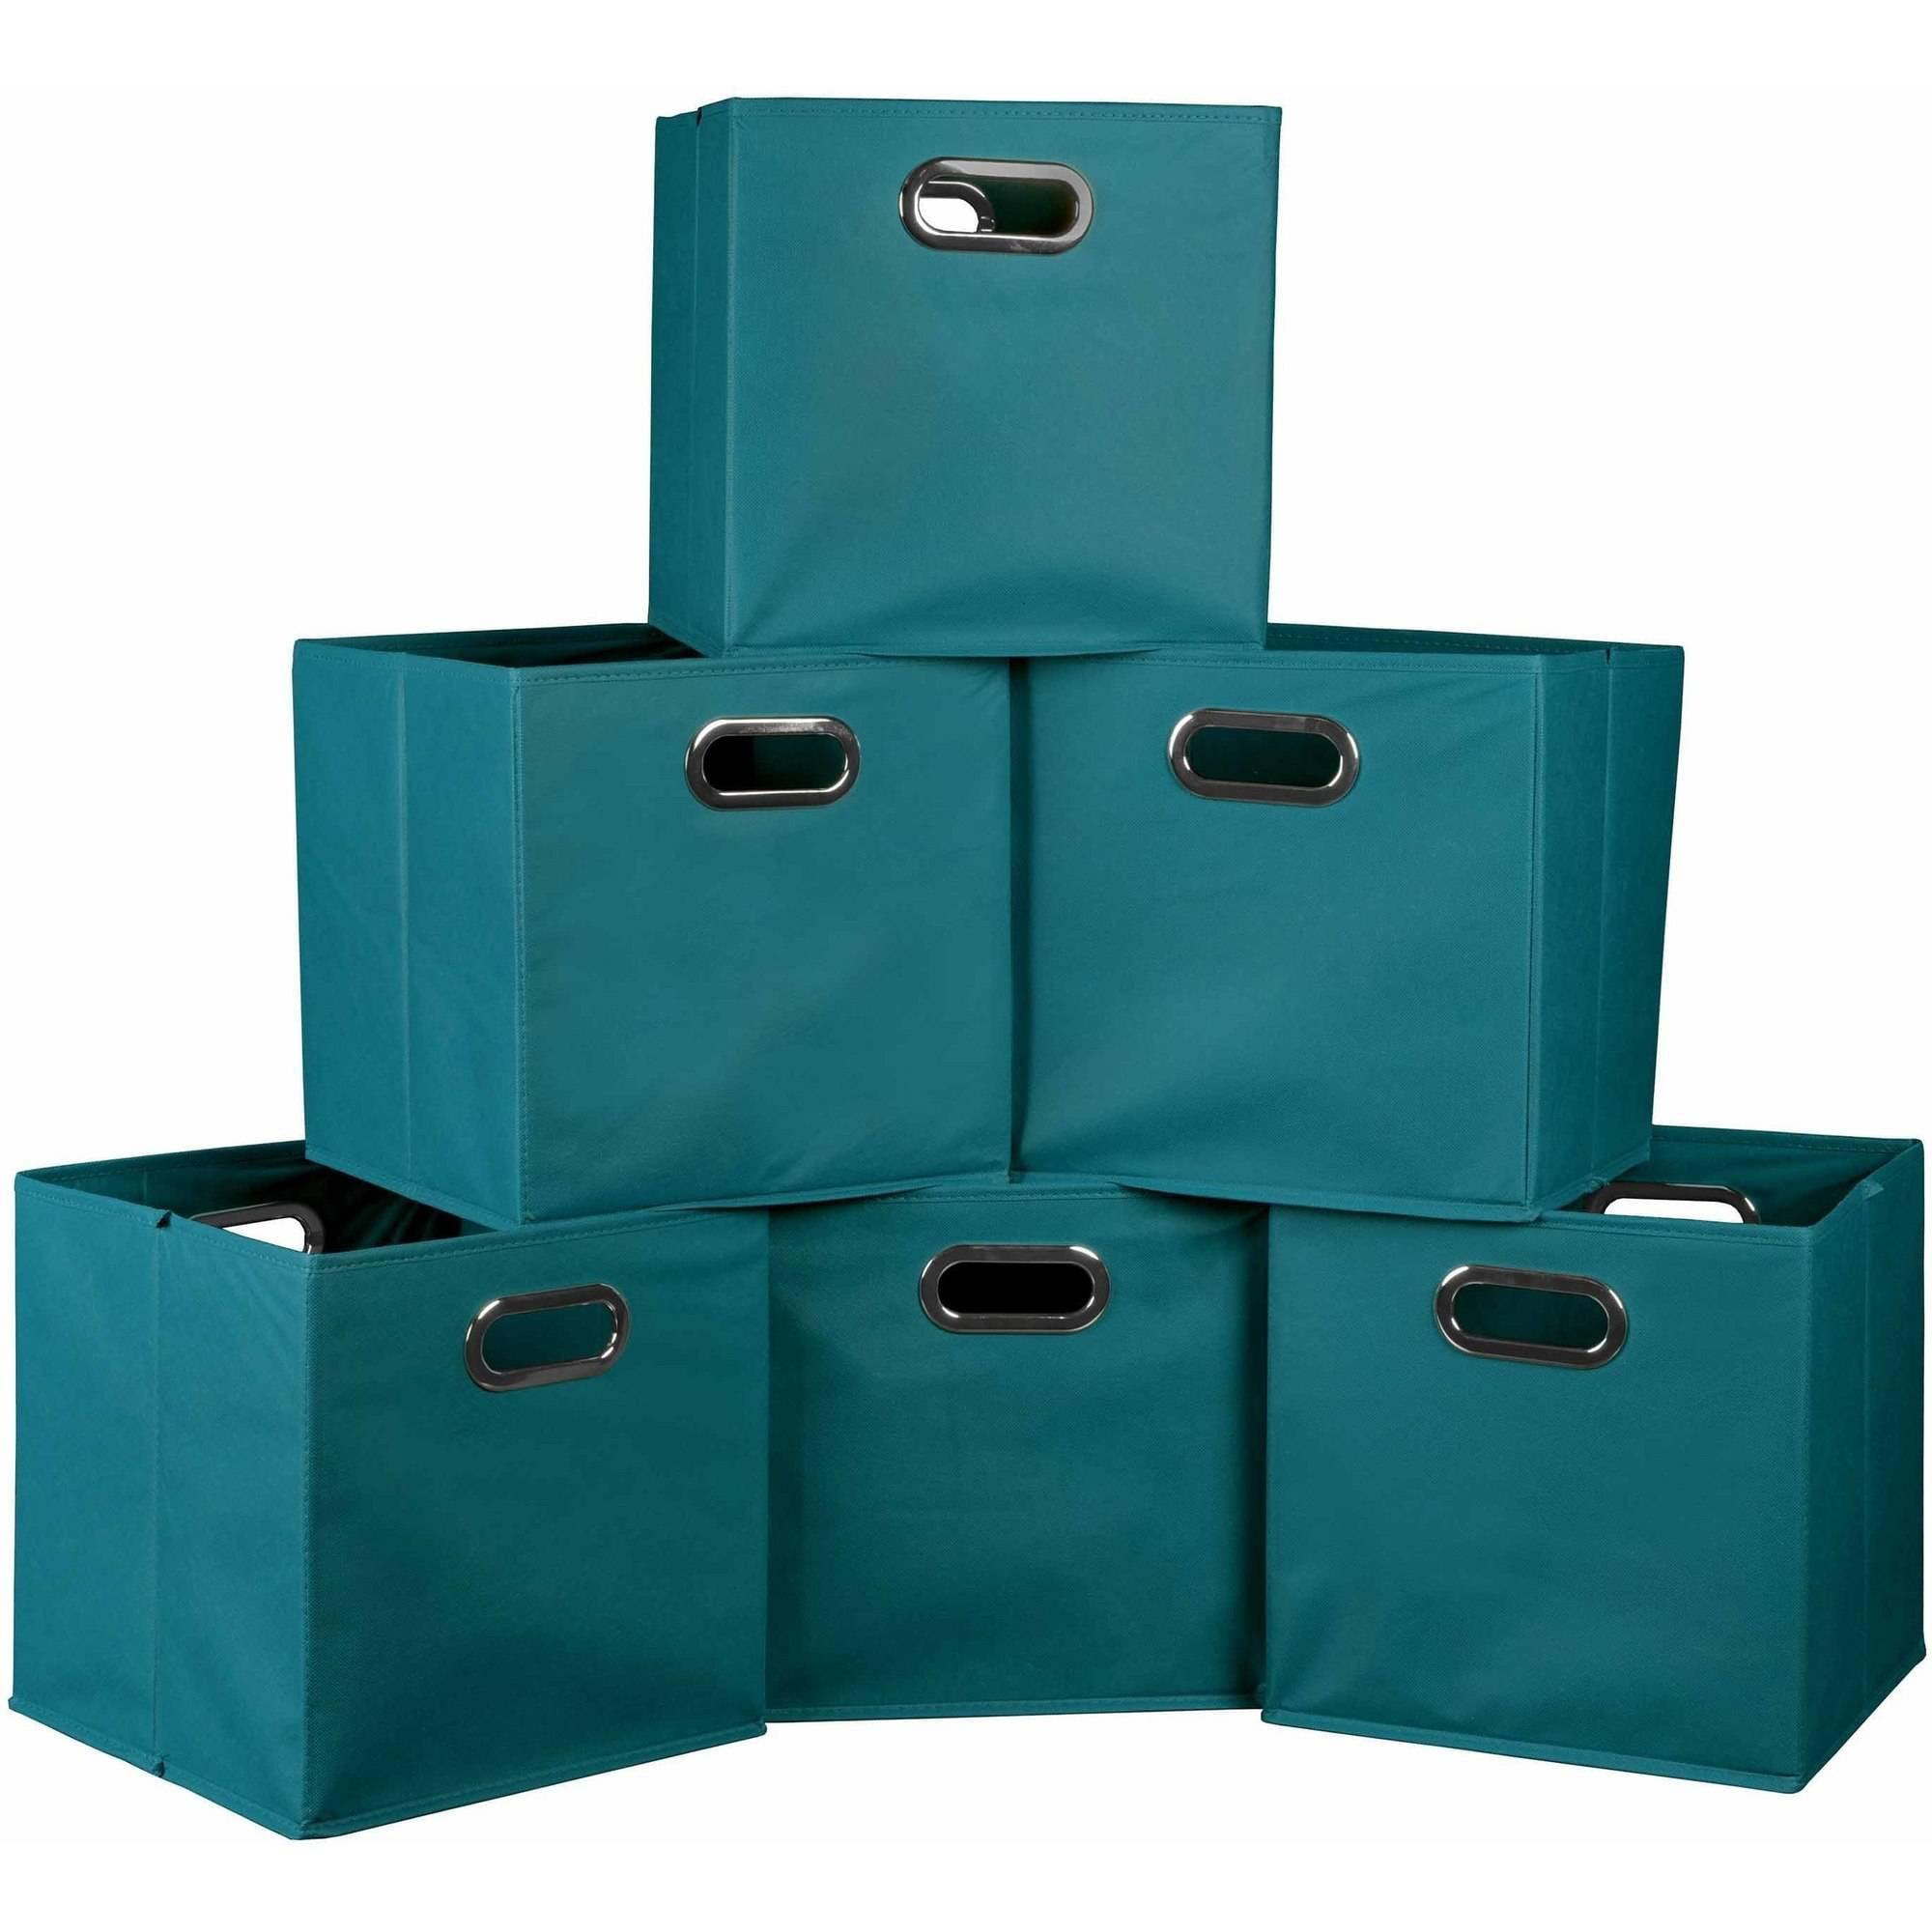 Niche Cubo Foldable Fabric Storage Bins, Set of 6, Multiple Colors